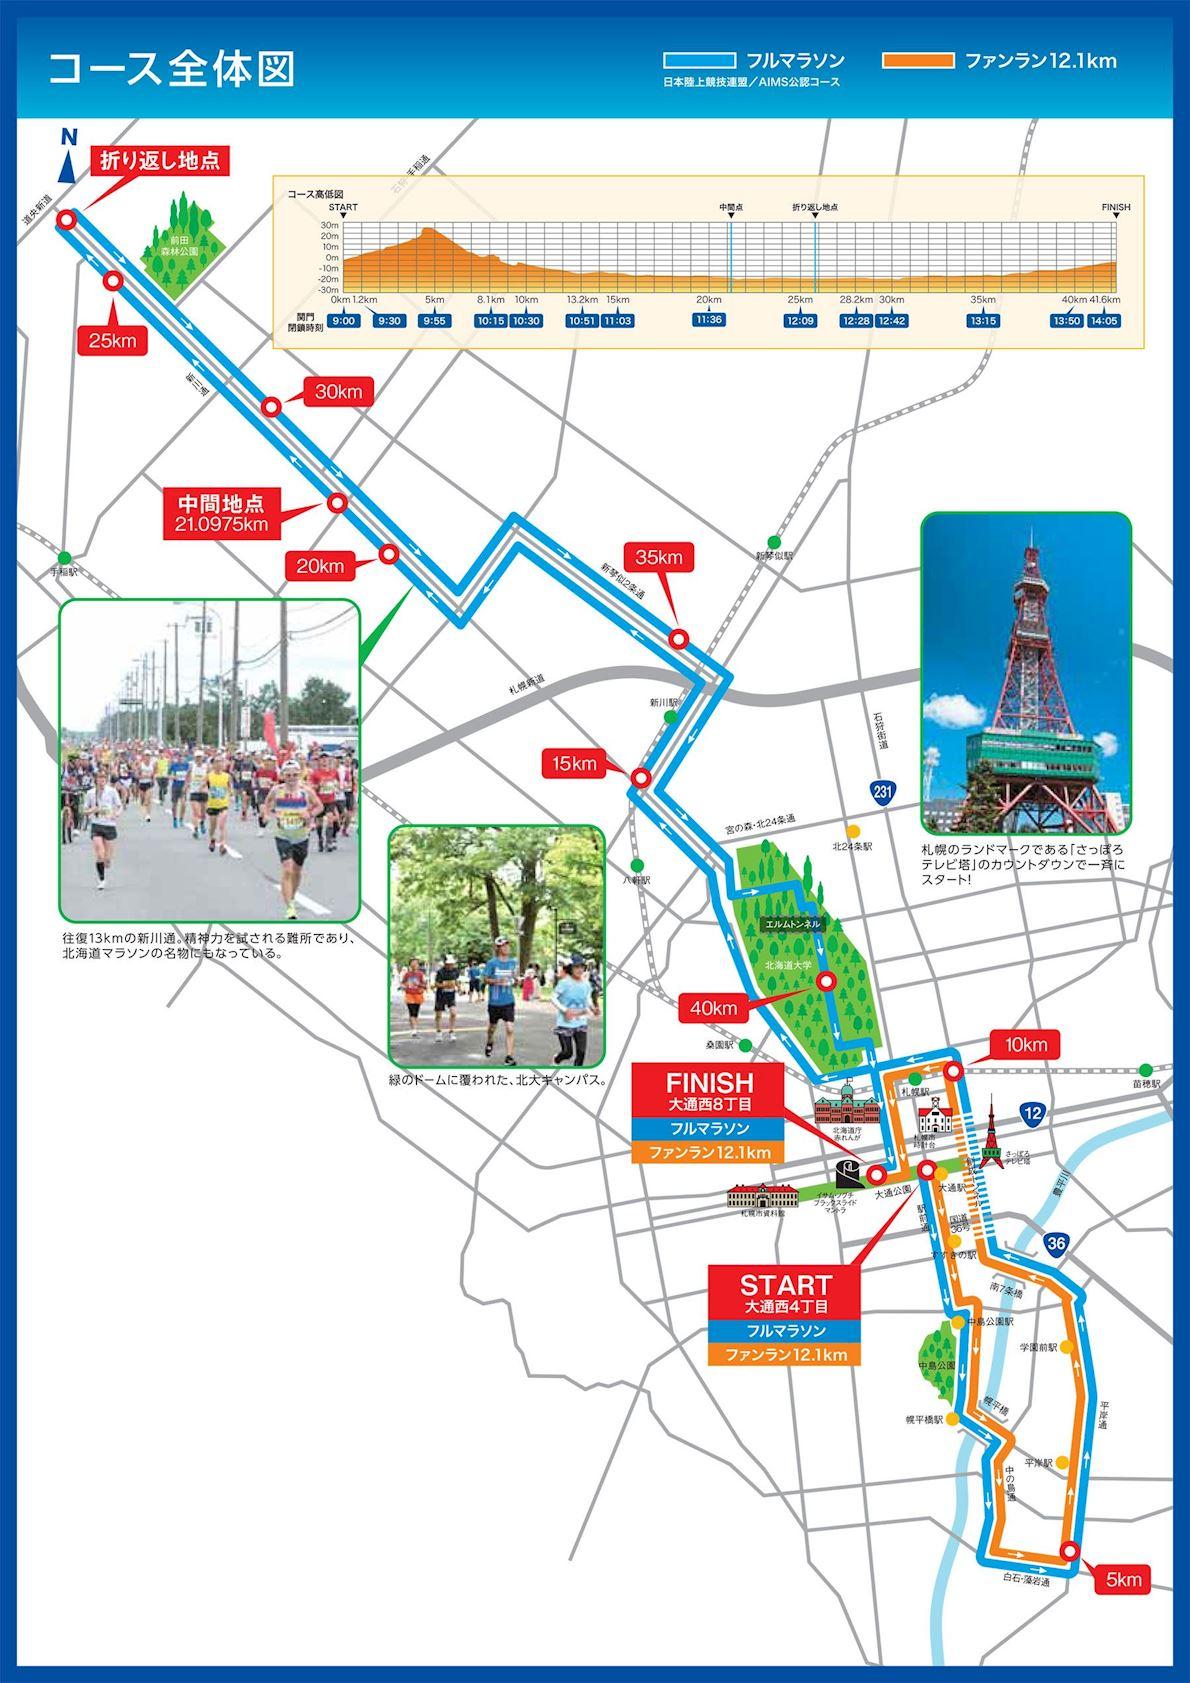 Hokkaido Marathon Mappa del percorso